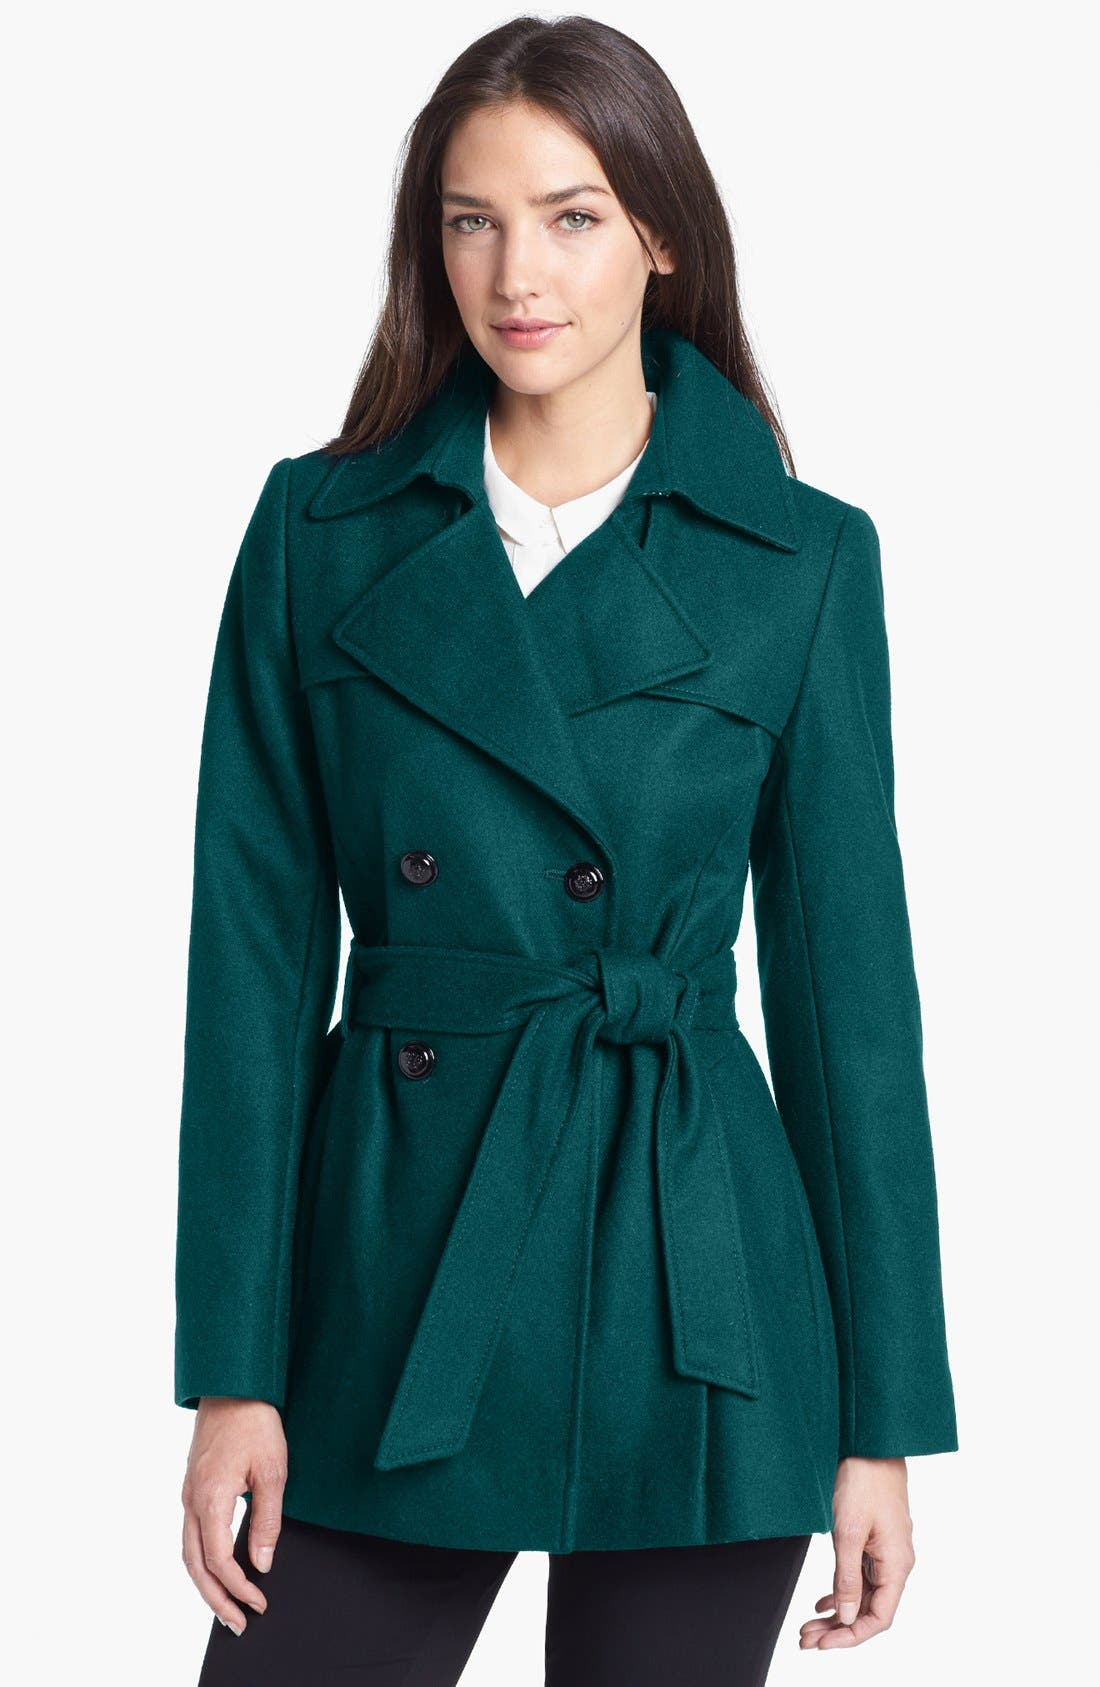 Alternate Image 1 Selected - Via Spiga Short Wool Blend Trench Coat (Online Only)